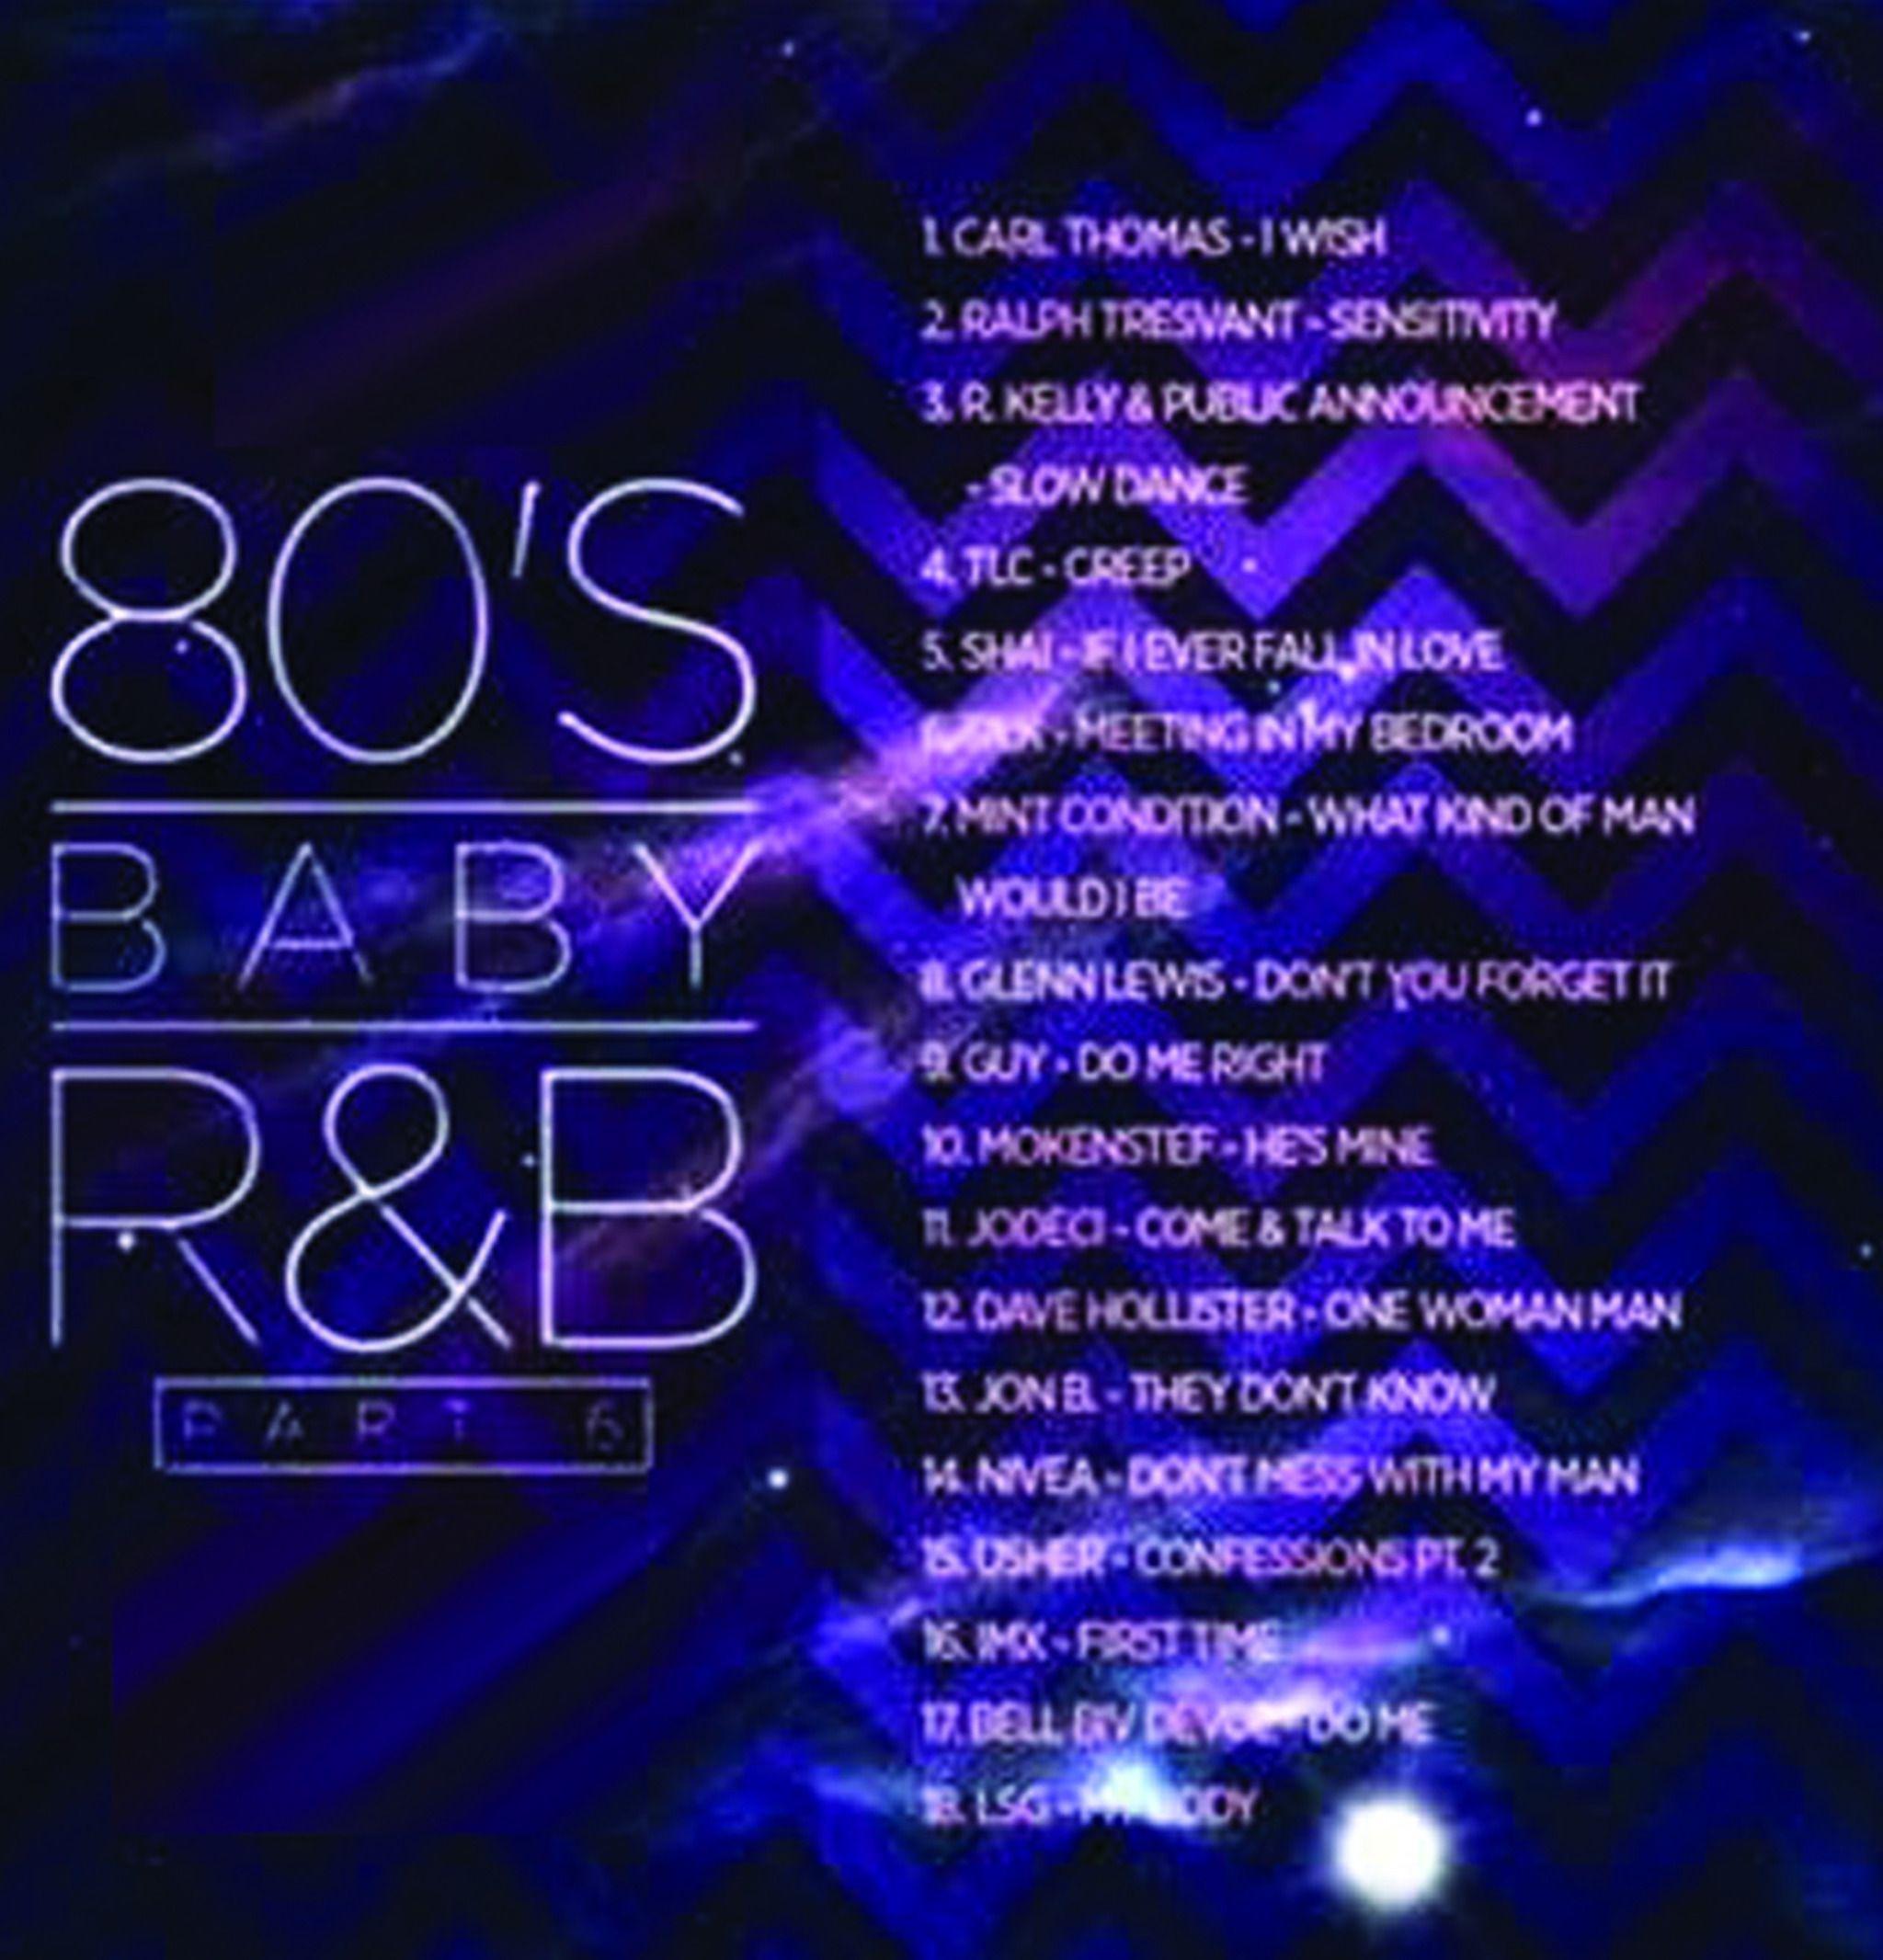 80 S Baby R B Pt 6 Mix Mp3 Download R B What Kind Of Man Usher Confessions